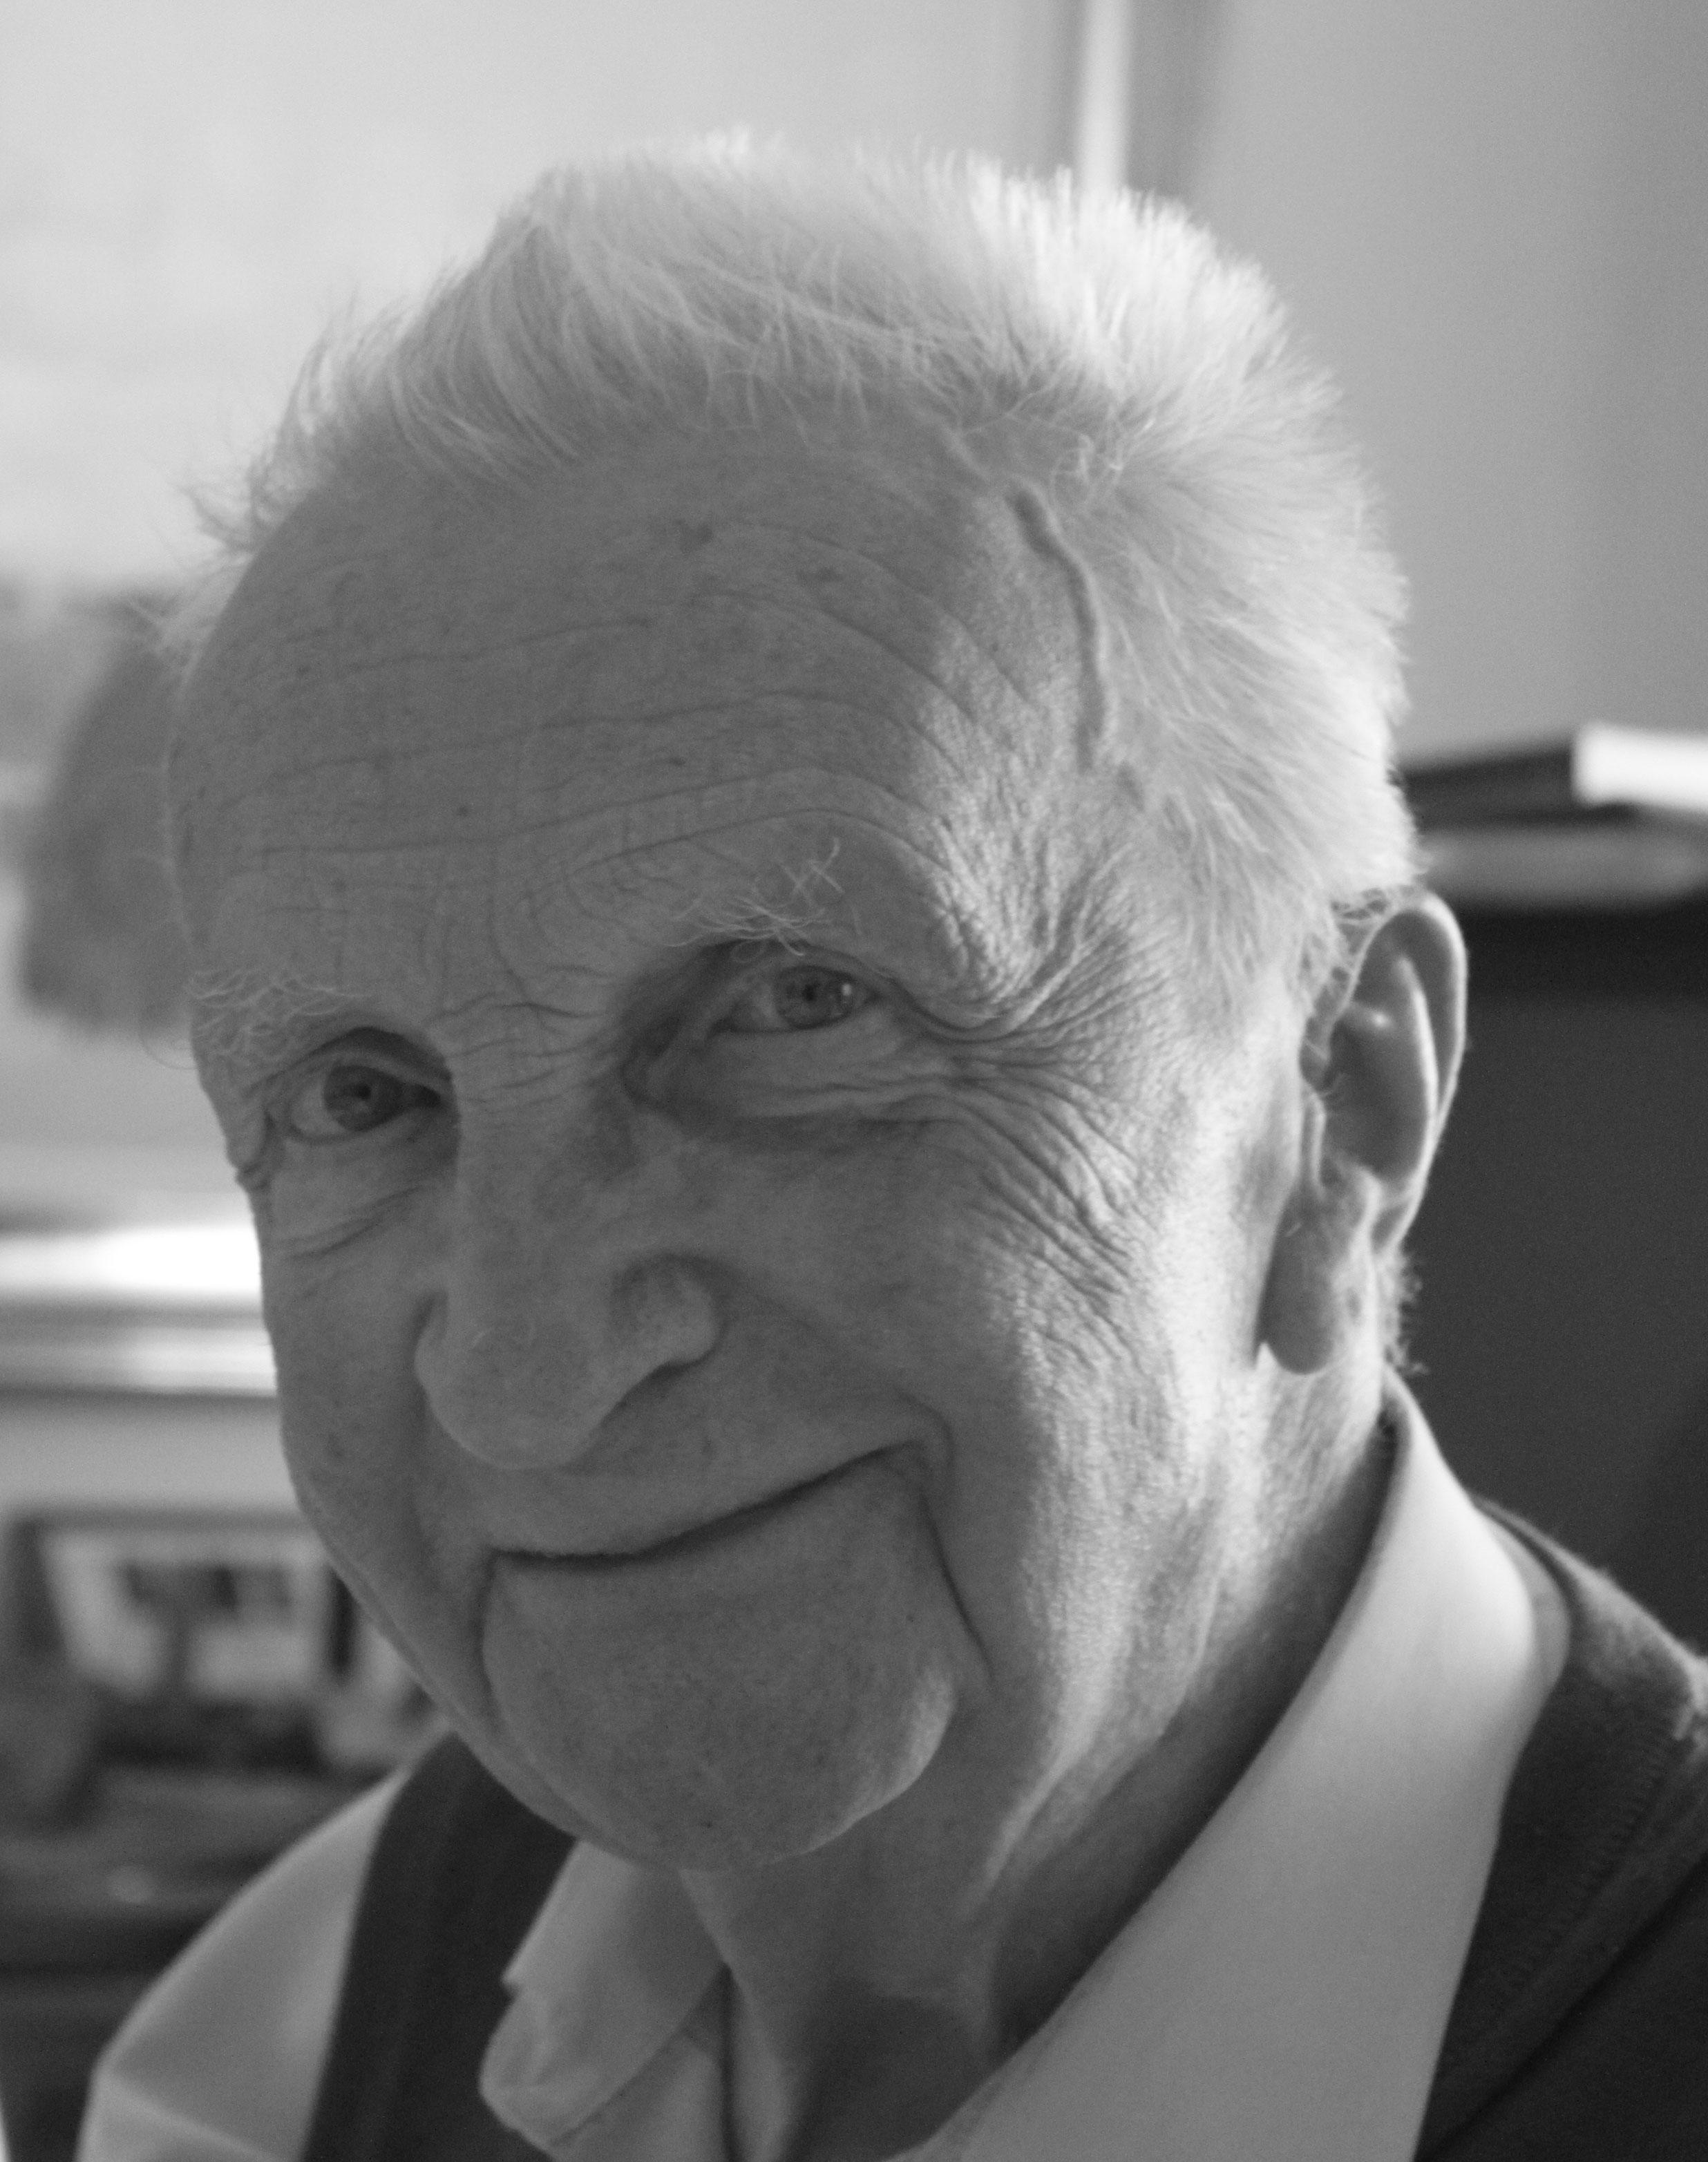 Professor emeritus Jan Grootaers